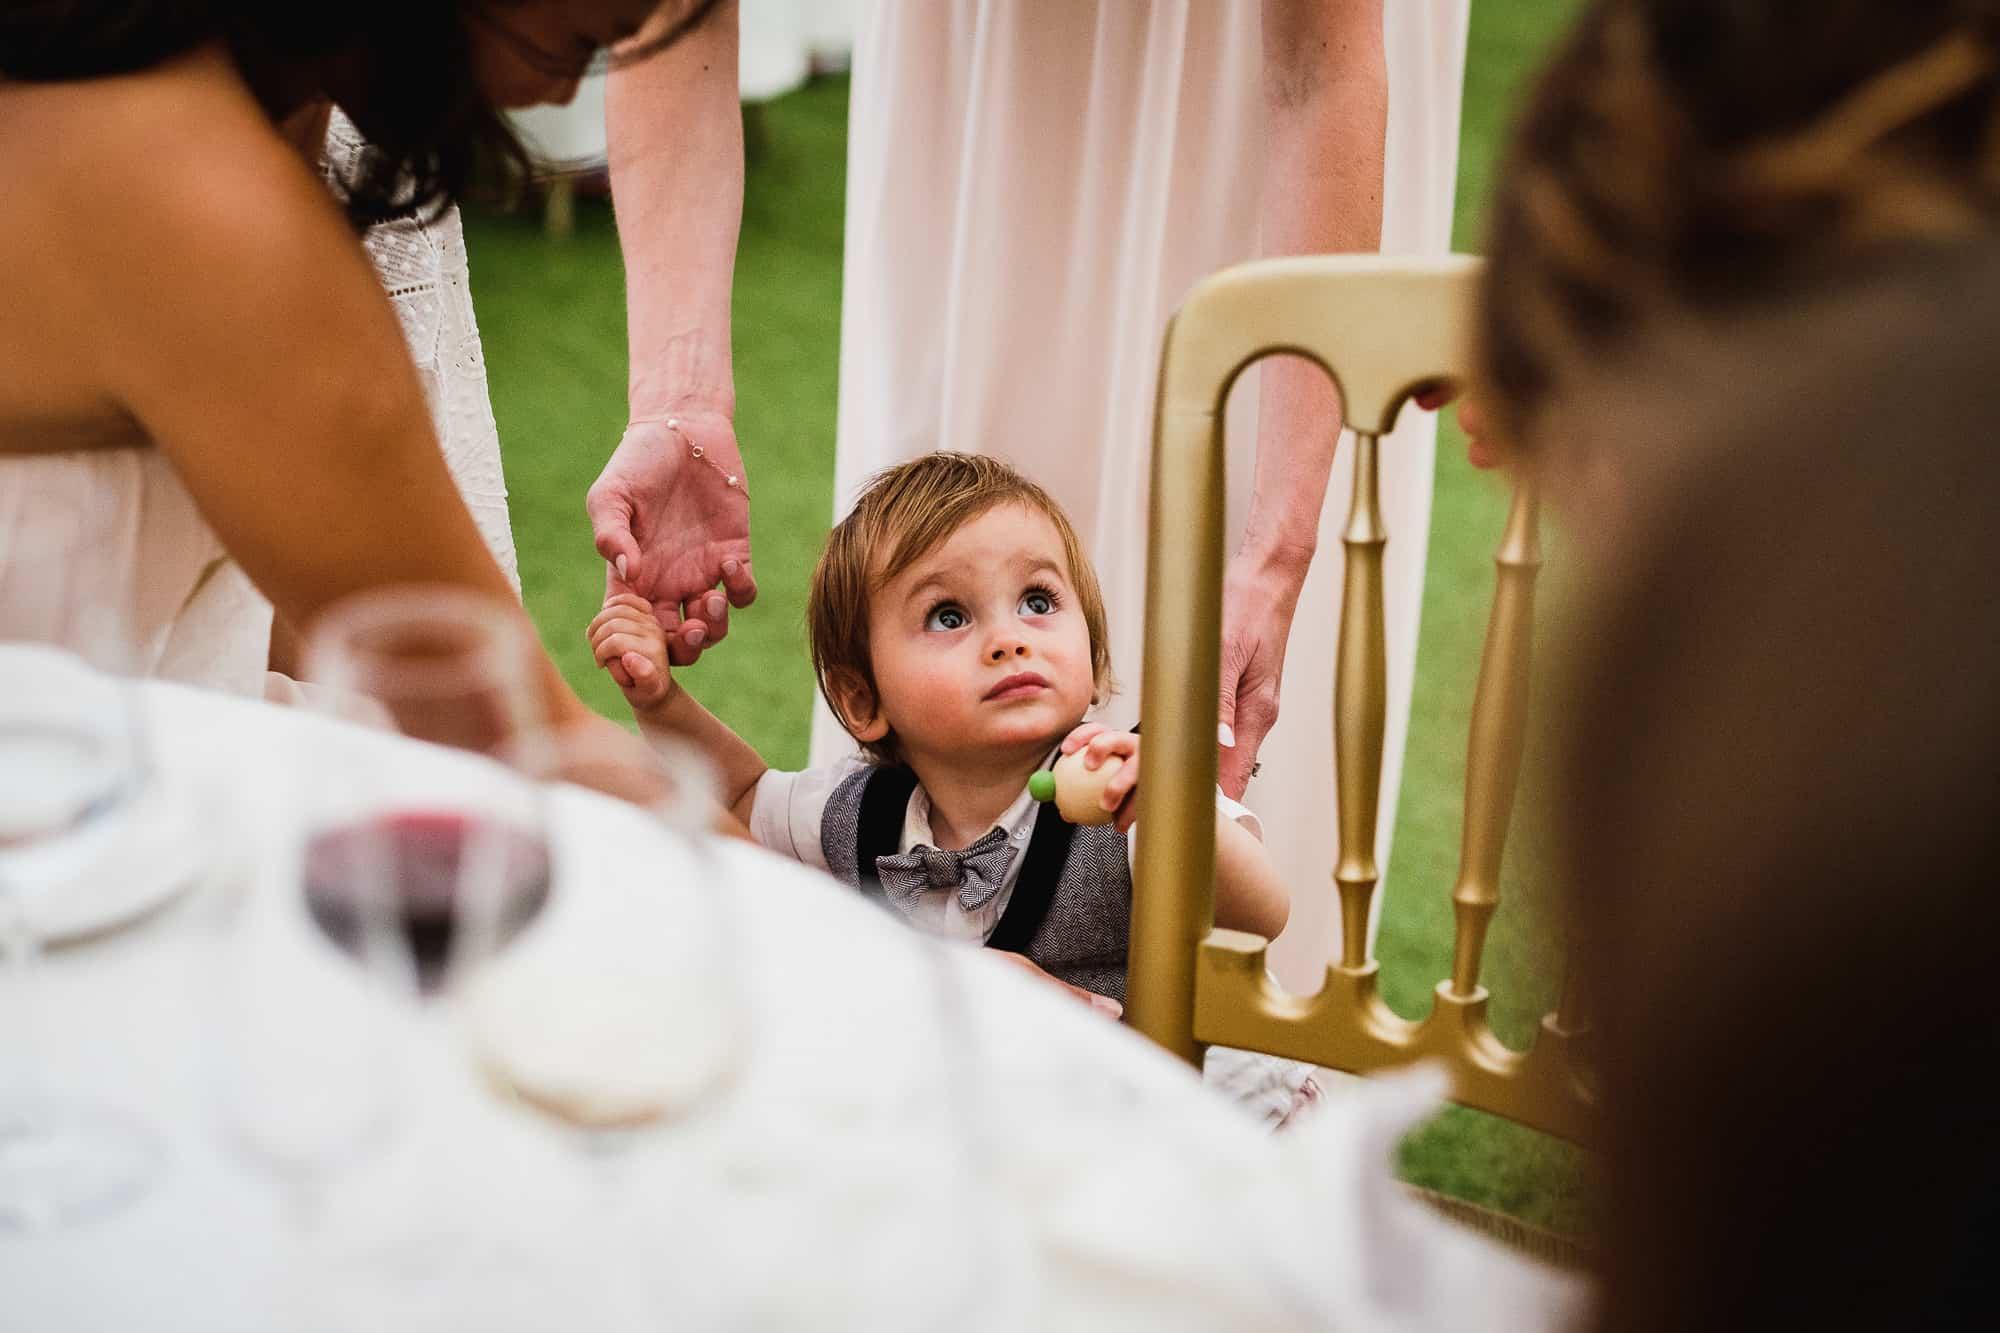 marleybrook-house-wedding-photography-matt-tyler-0050